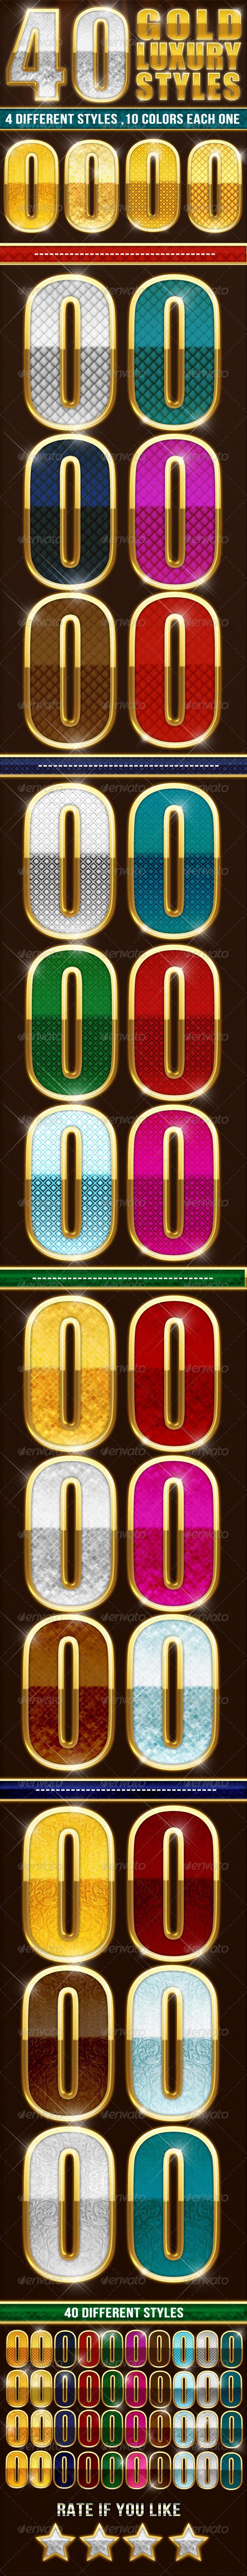 GraphicRiver 40 Elegant Gold Luxury Styles 5359915